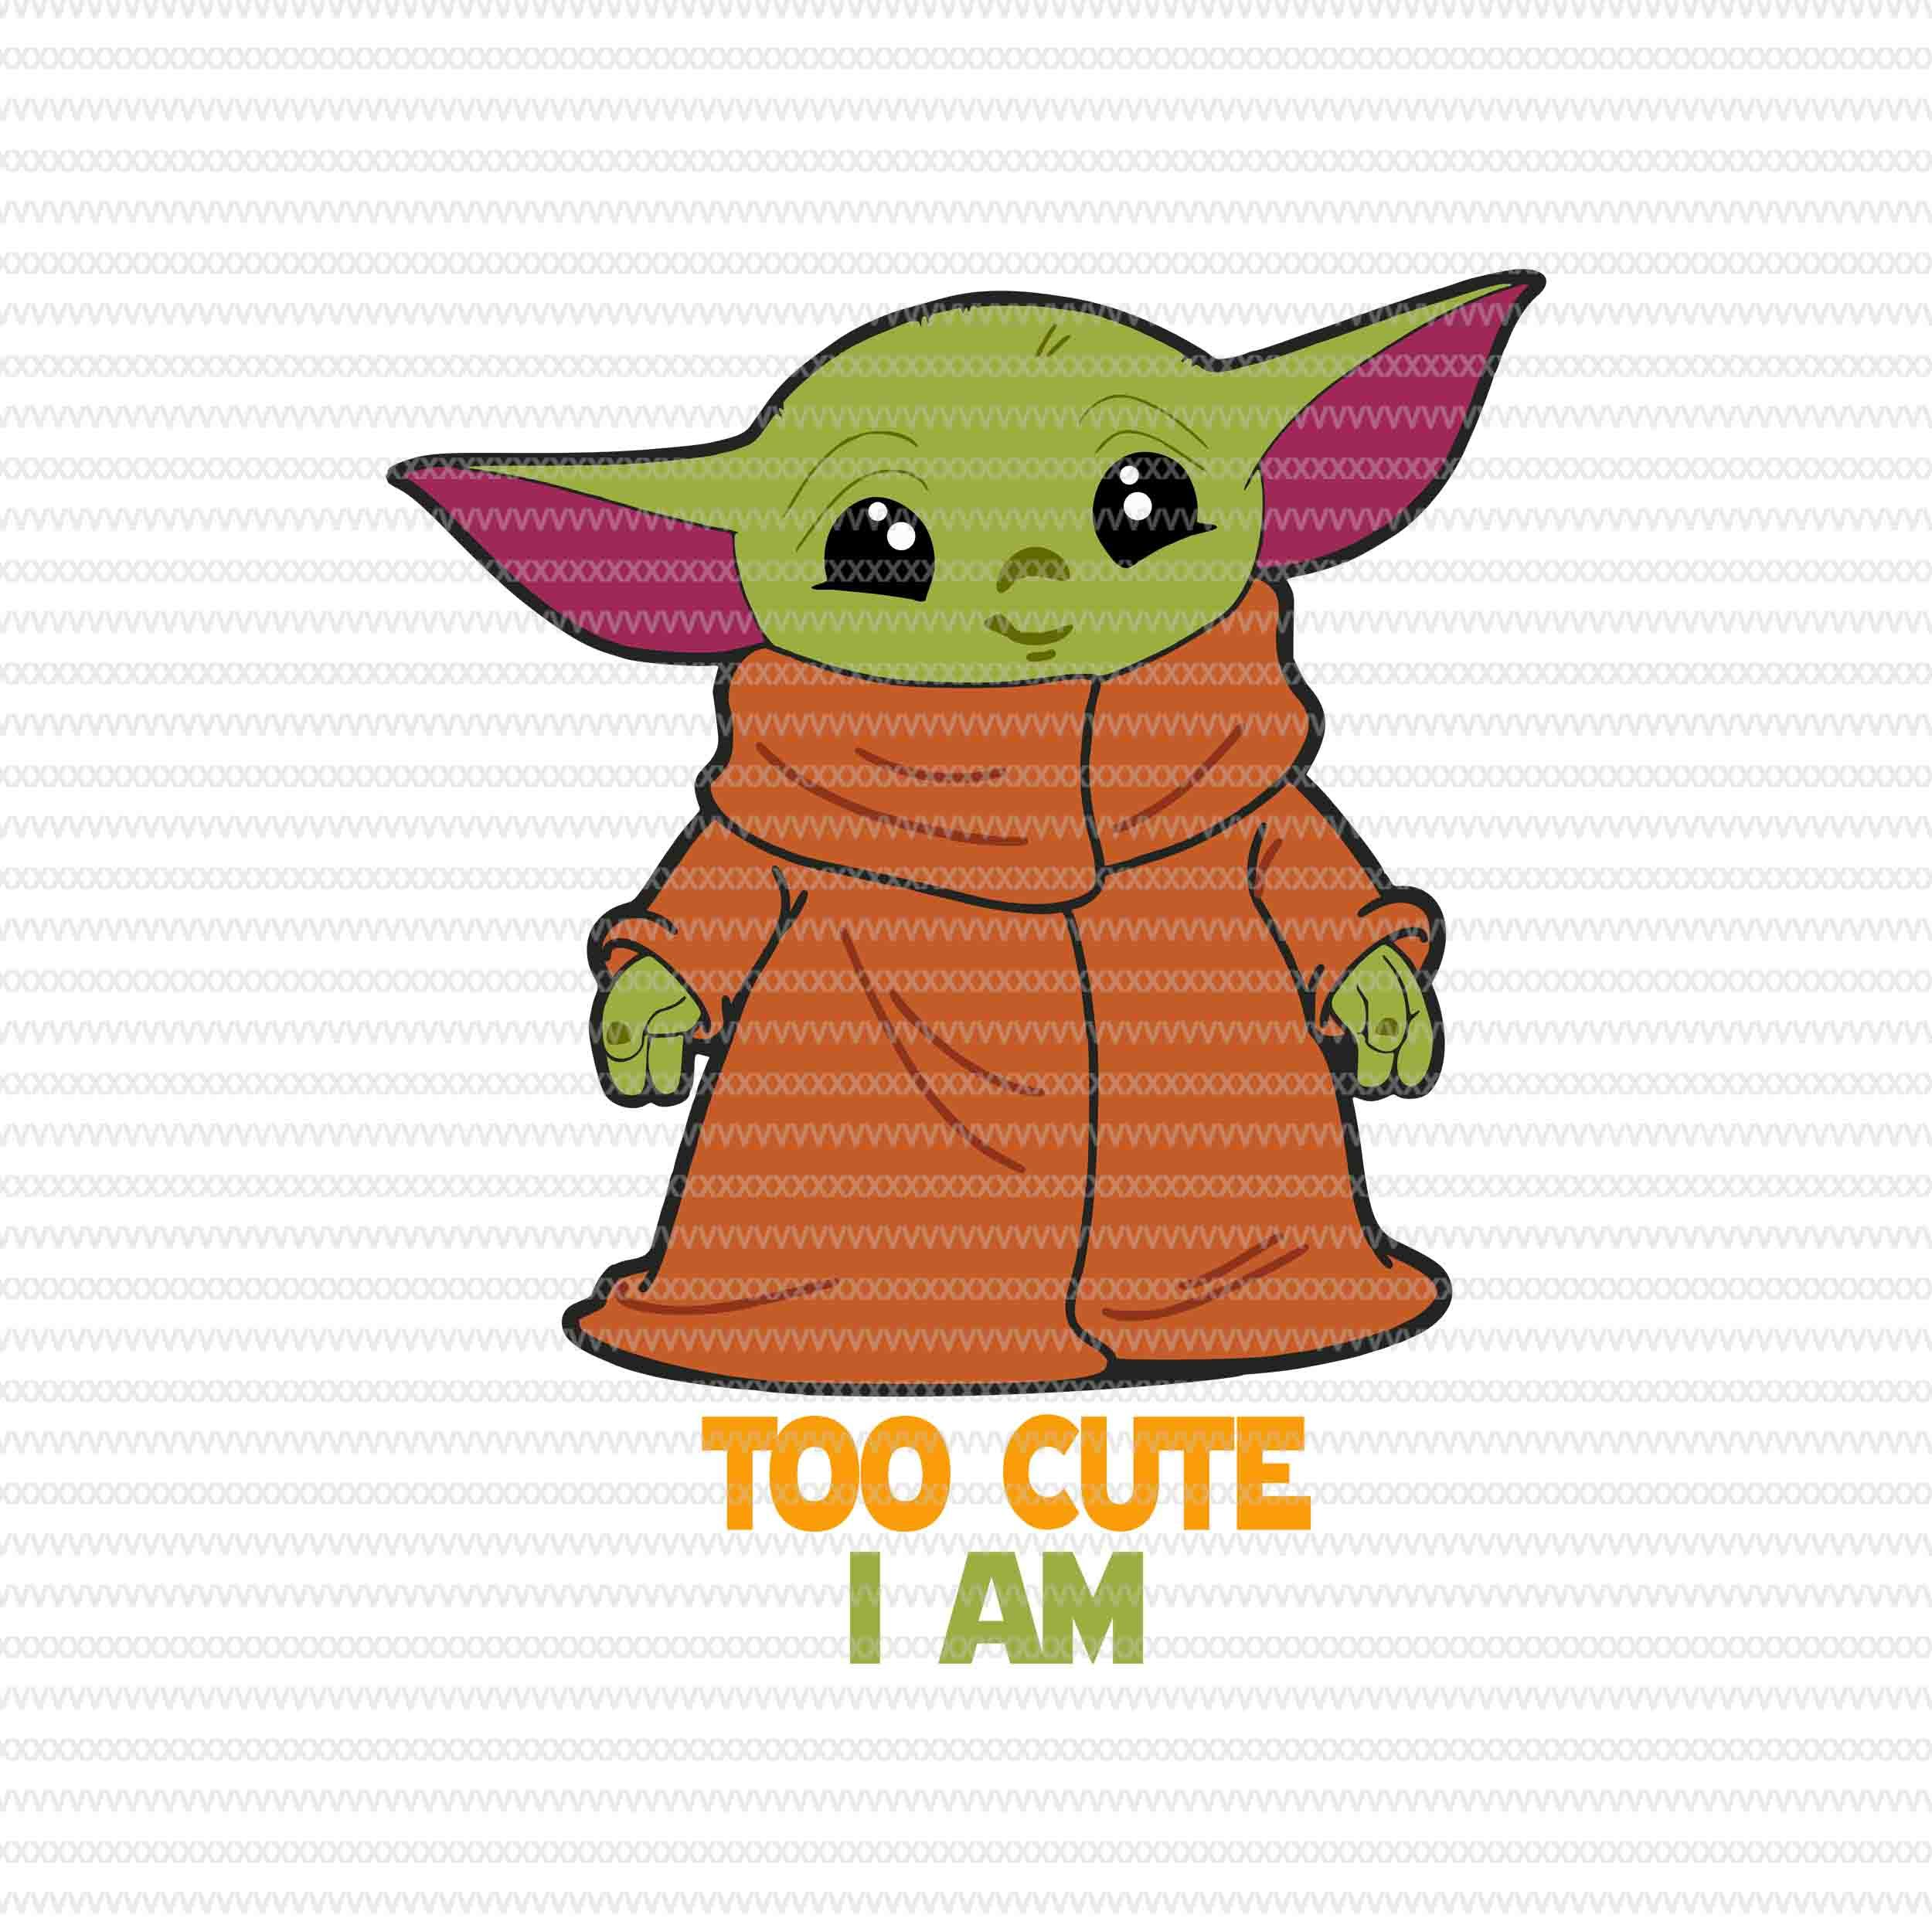 Too Cute I Am Baby Yoda Svg Baby Yoda Png Baby By Shopsvgpro On Zibbet